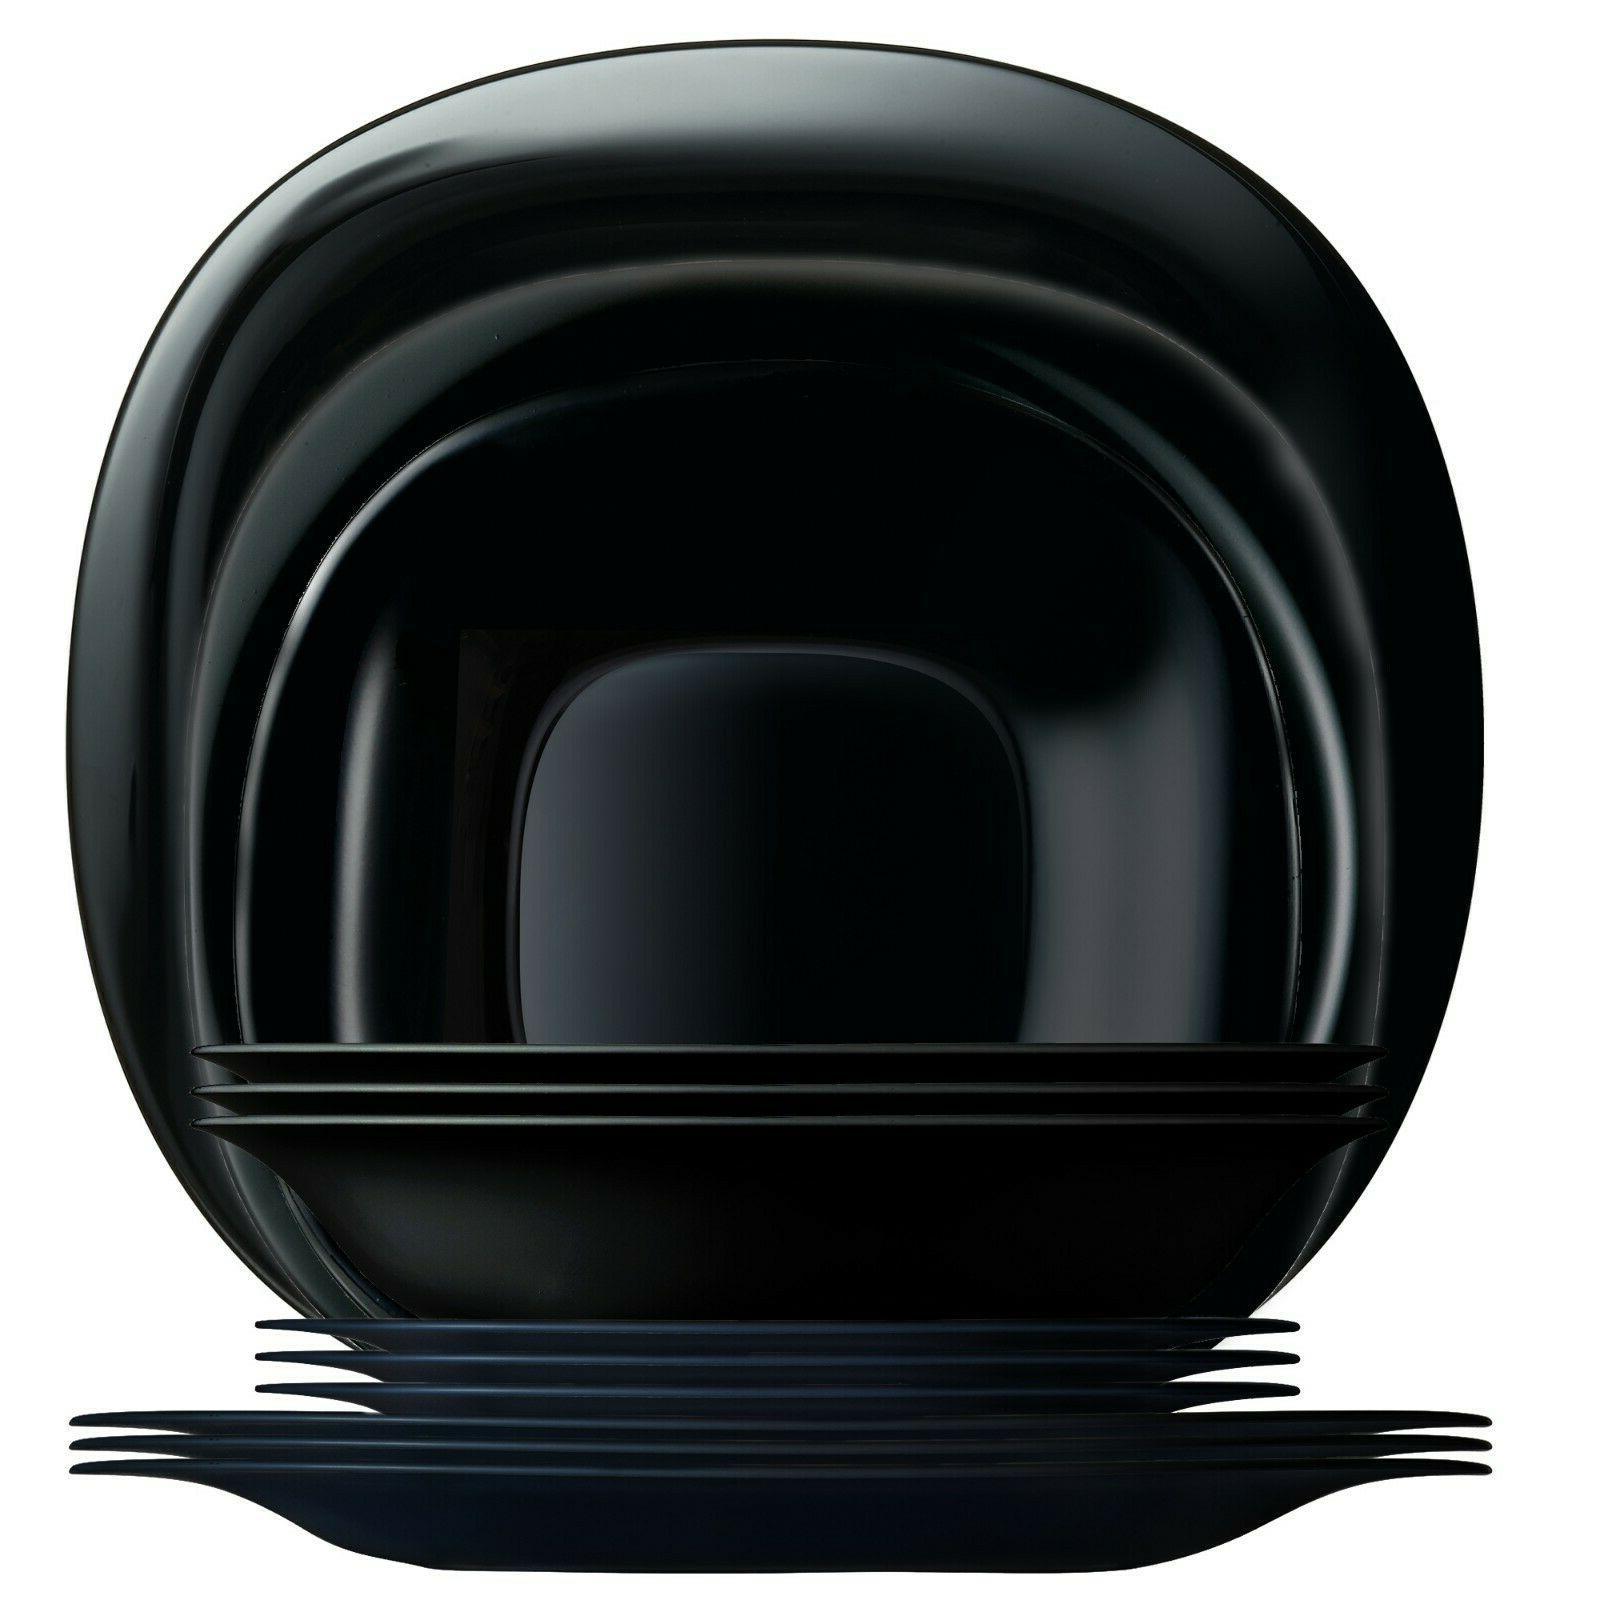 carine black dinnerware service for 4 12